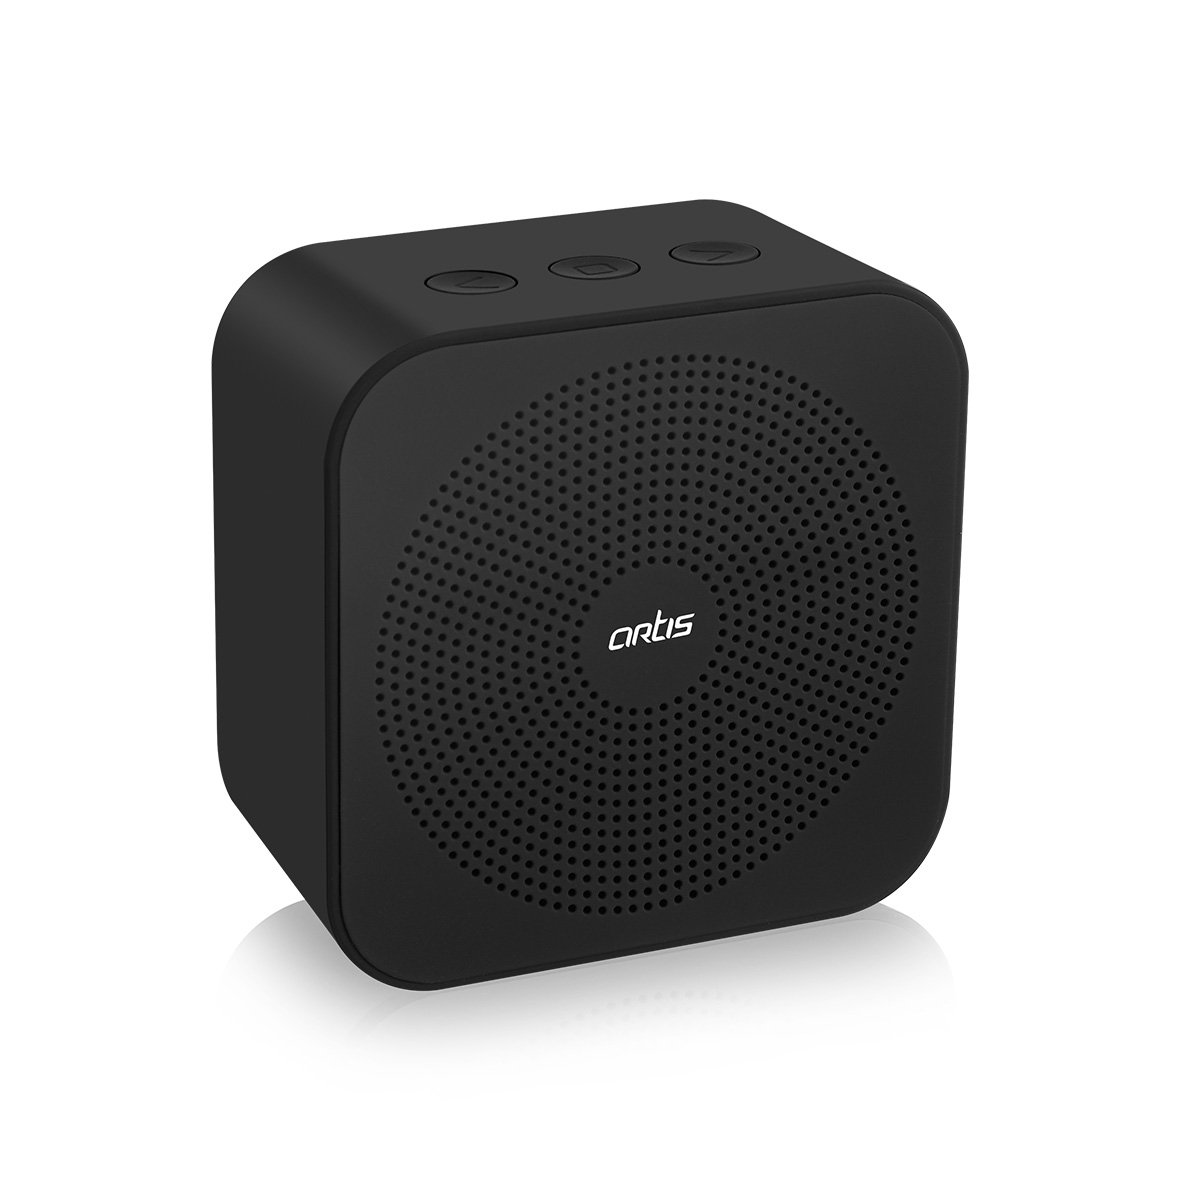 Artis BT15 Wireless Portable Bluetooth Speaker with Aux Input - Black